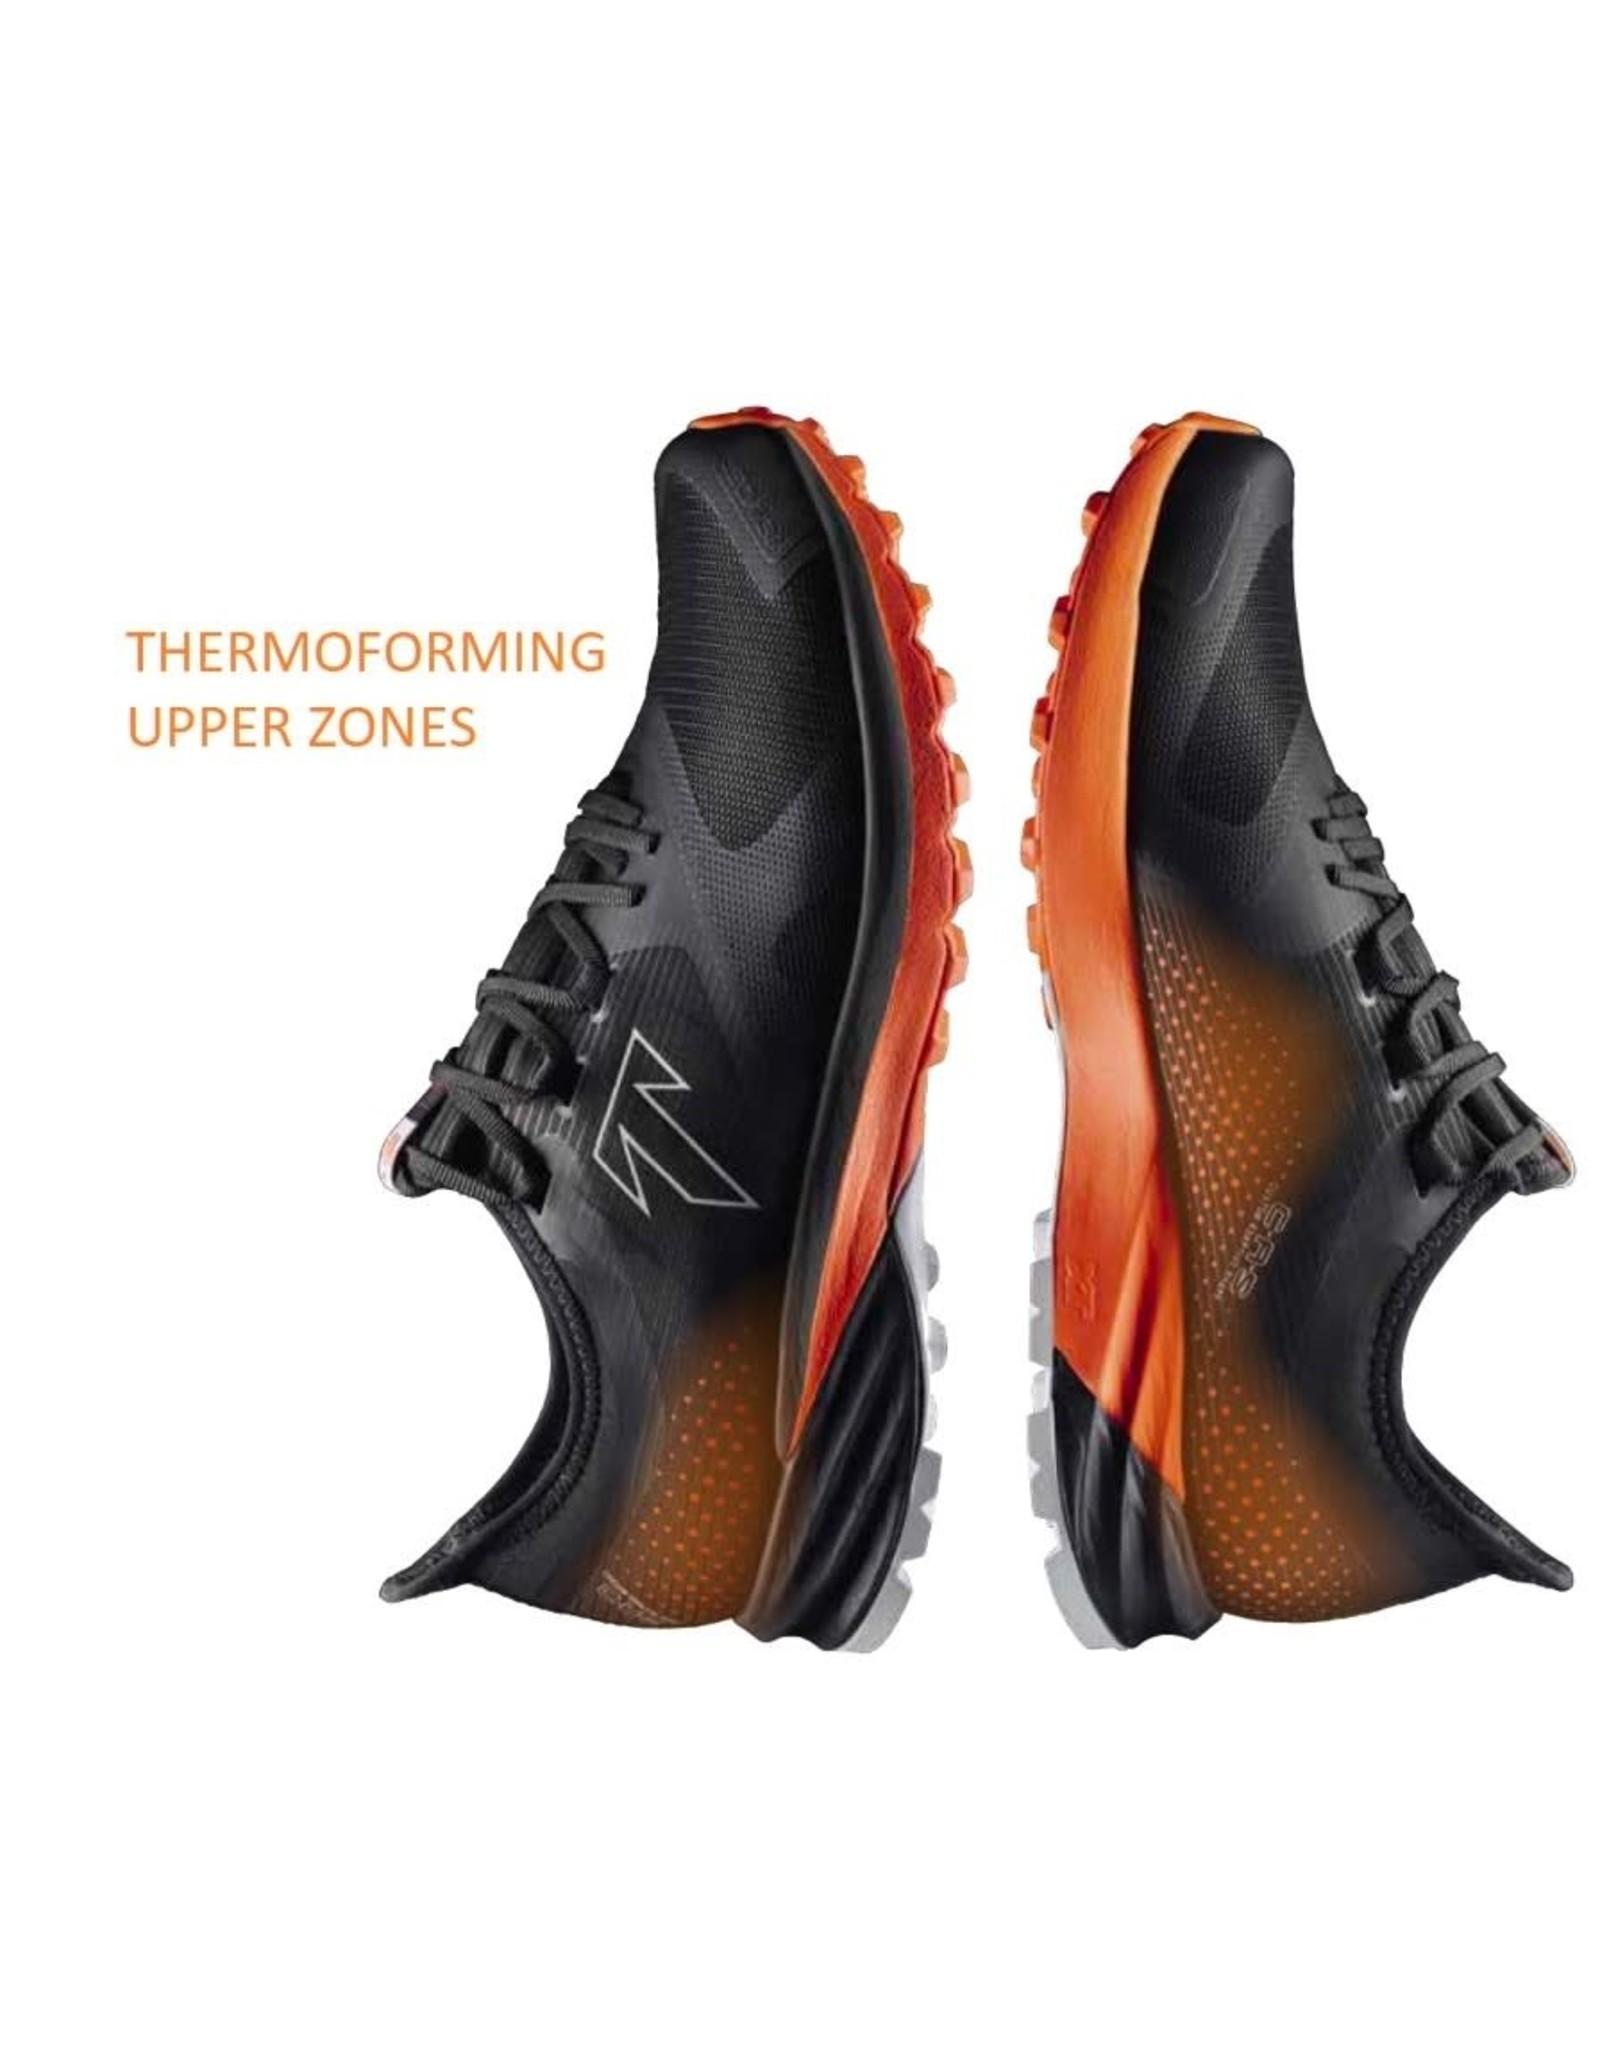 Tecnica Tecnica Origin LT Shoe - Women